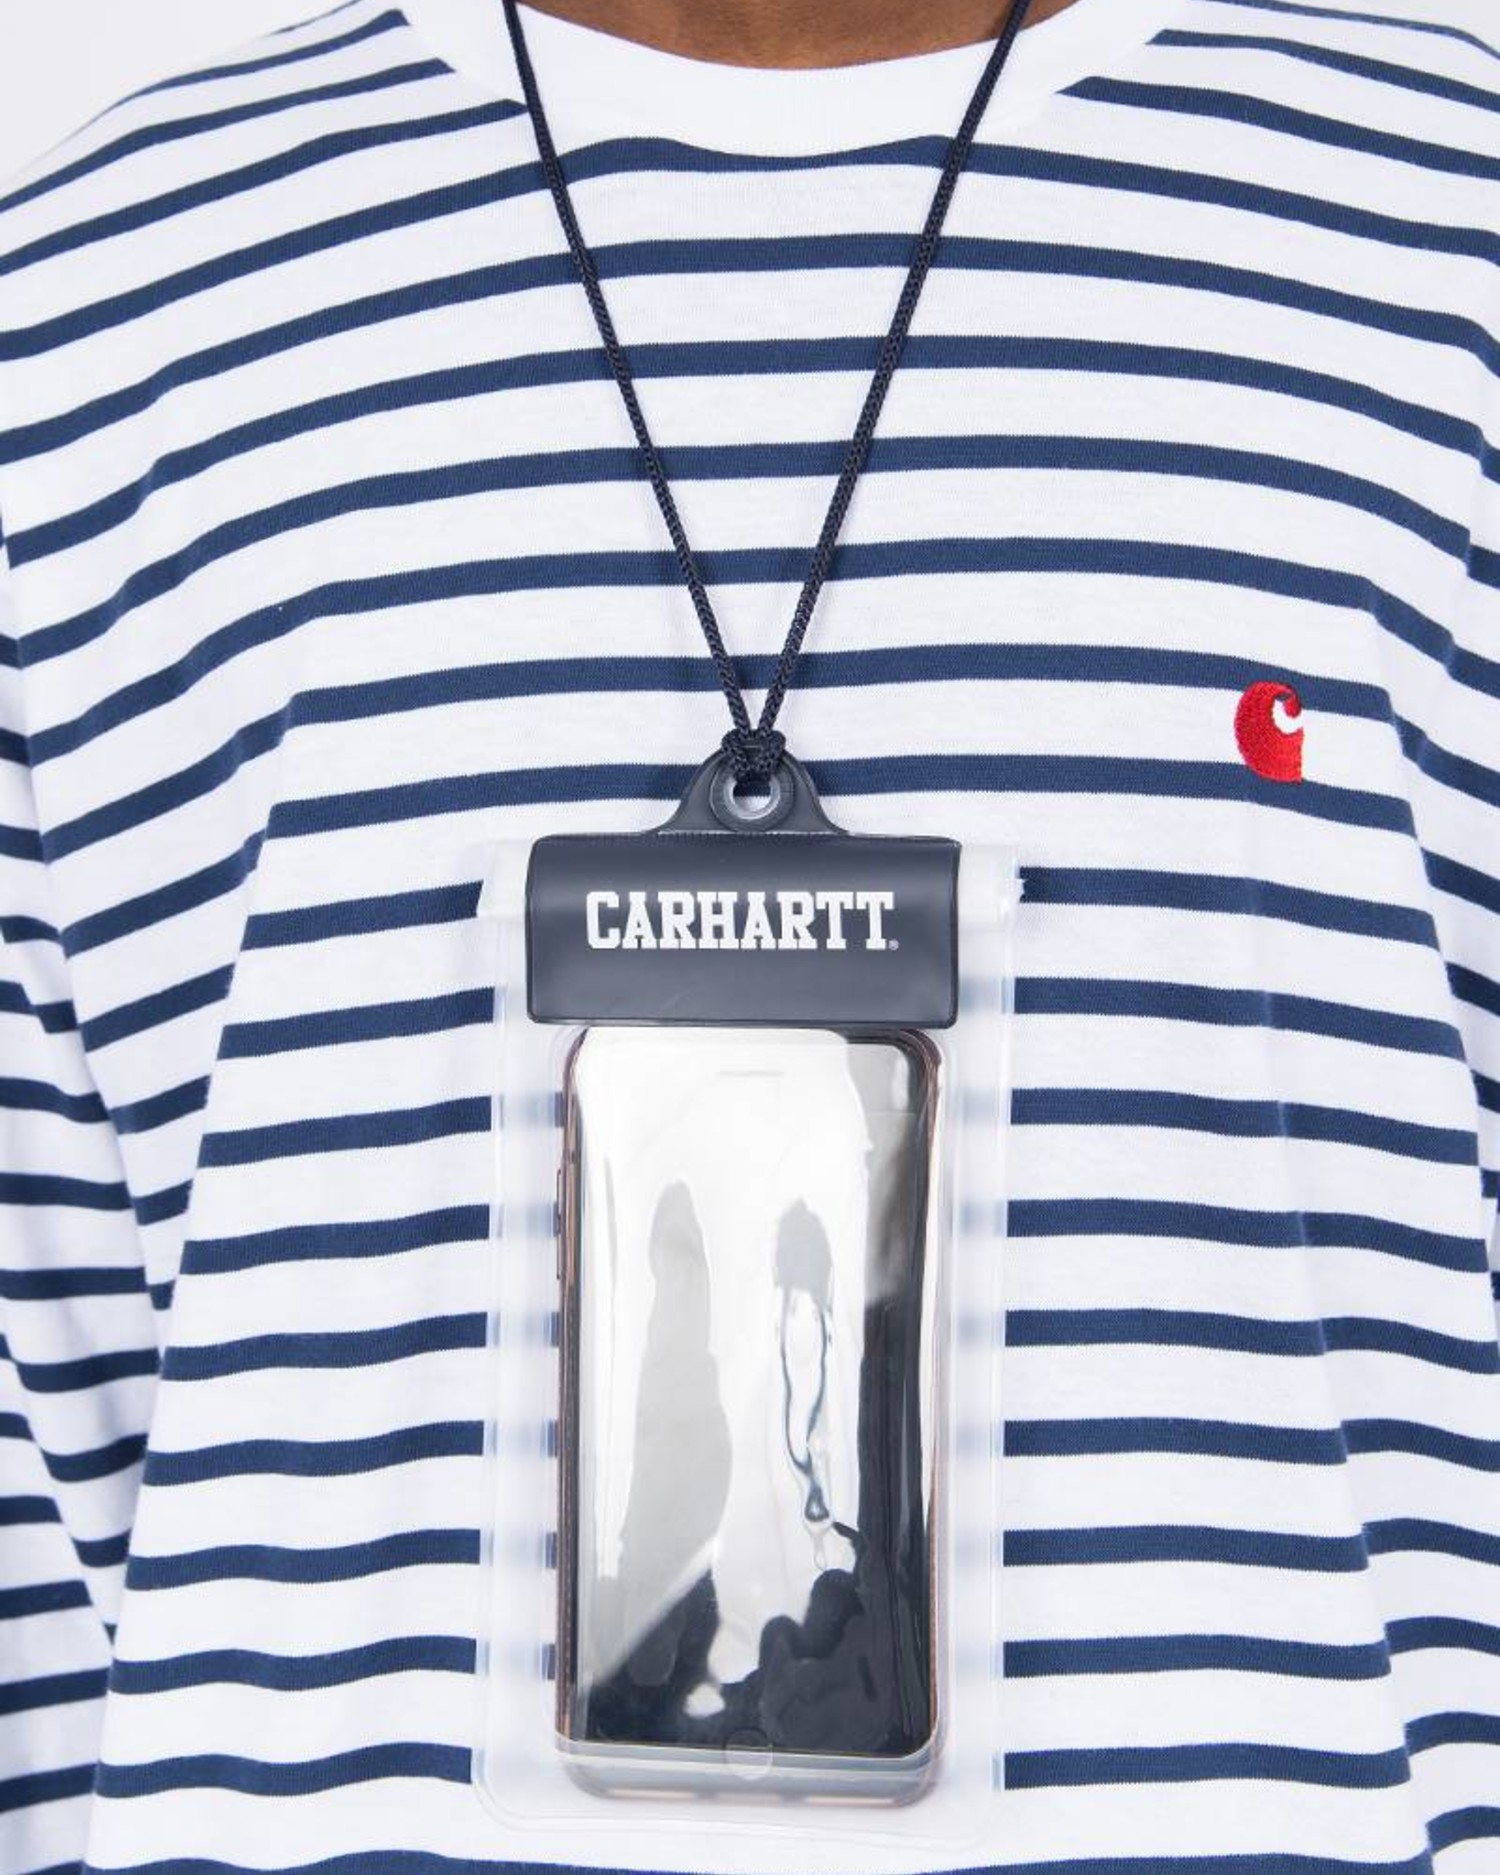 Carhartt Waterproof Phone Pouch PVC Transparant